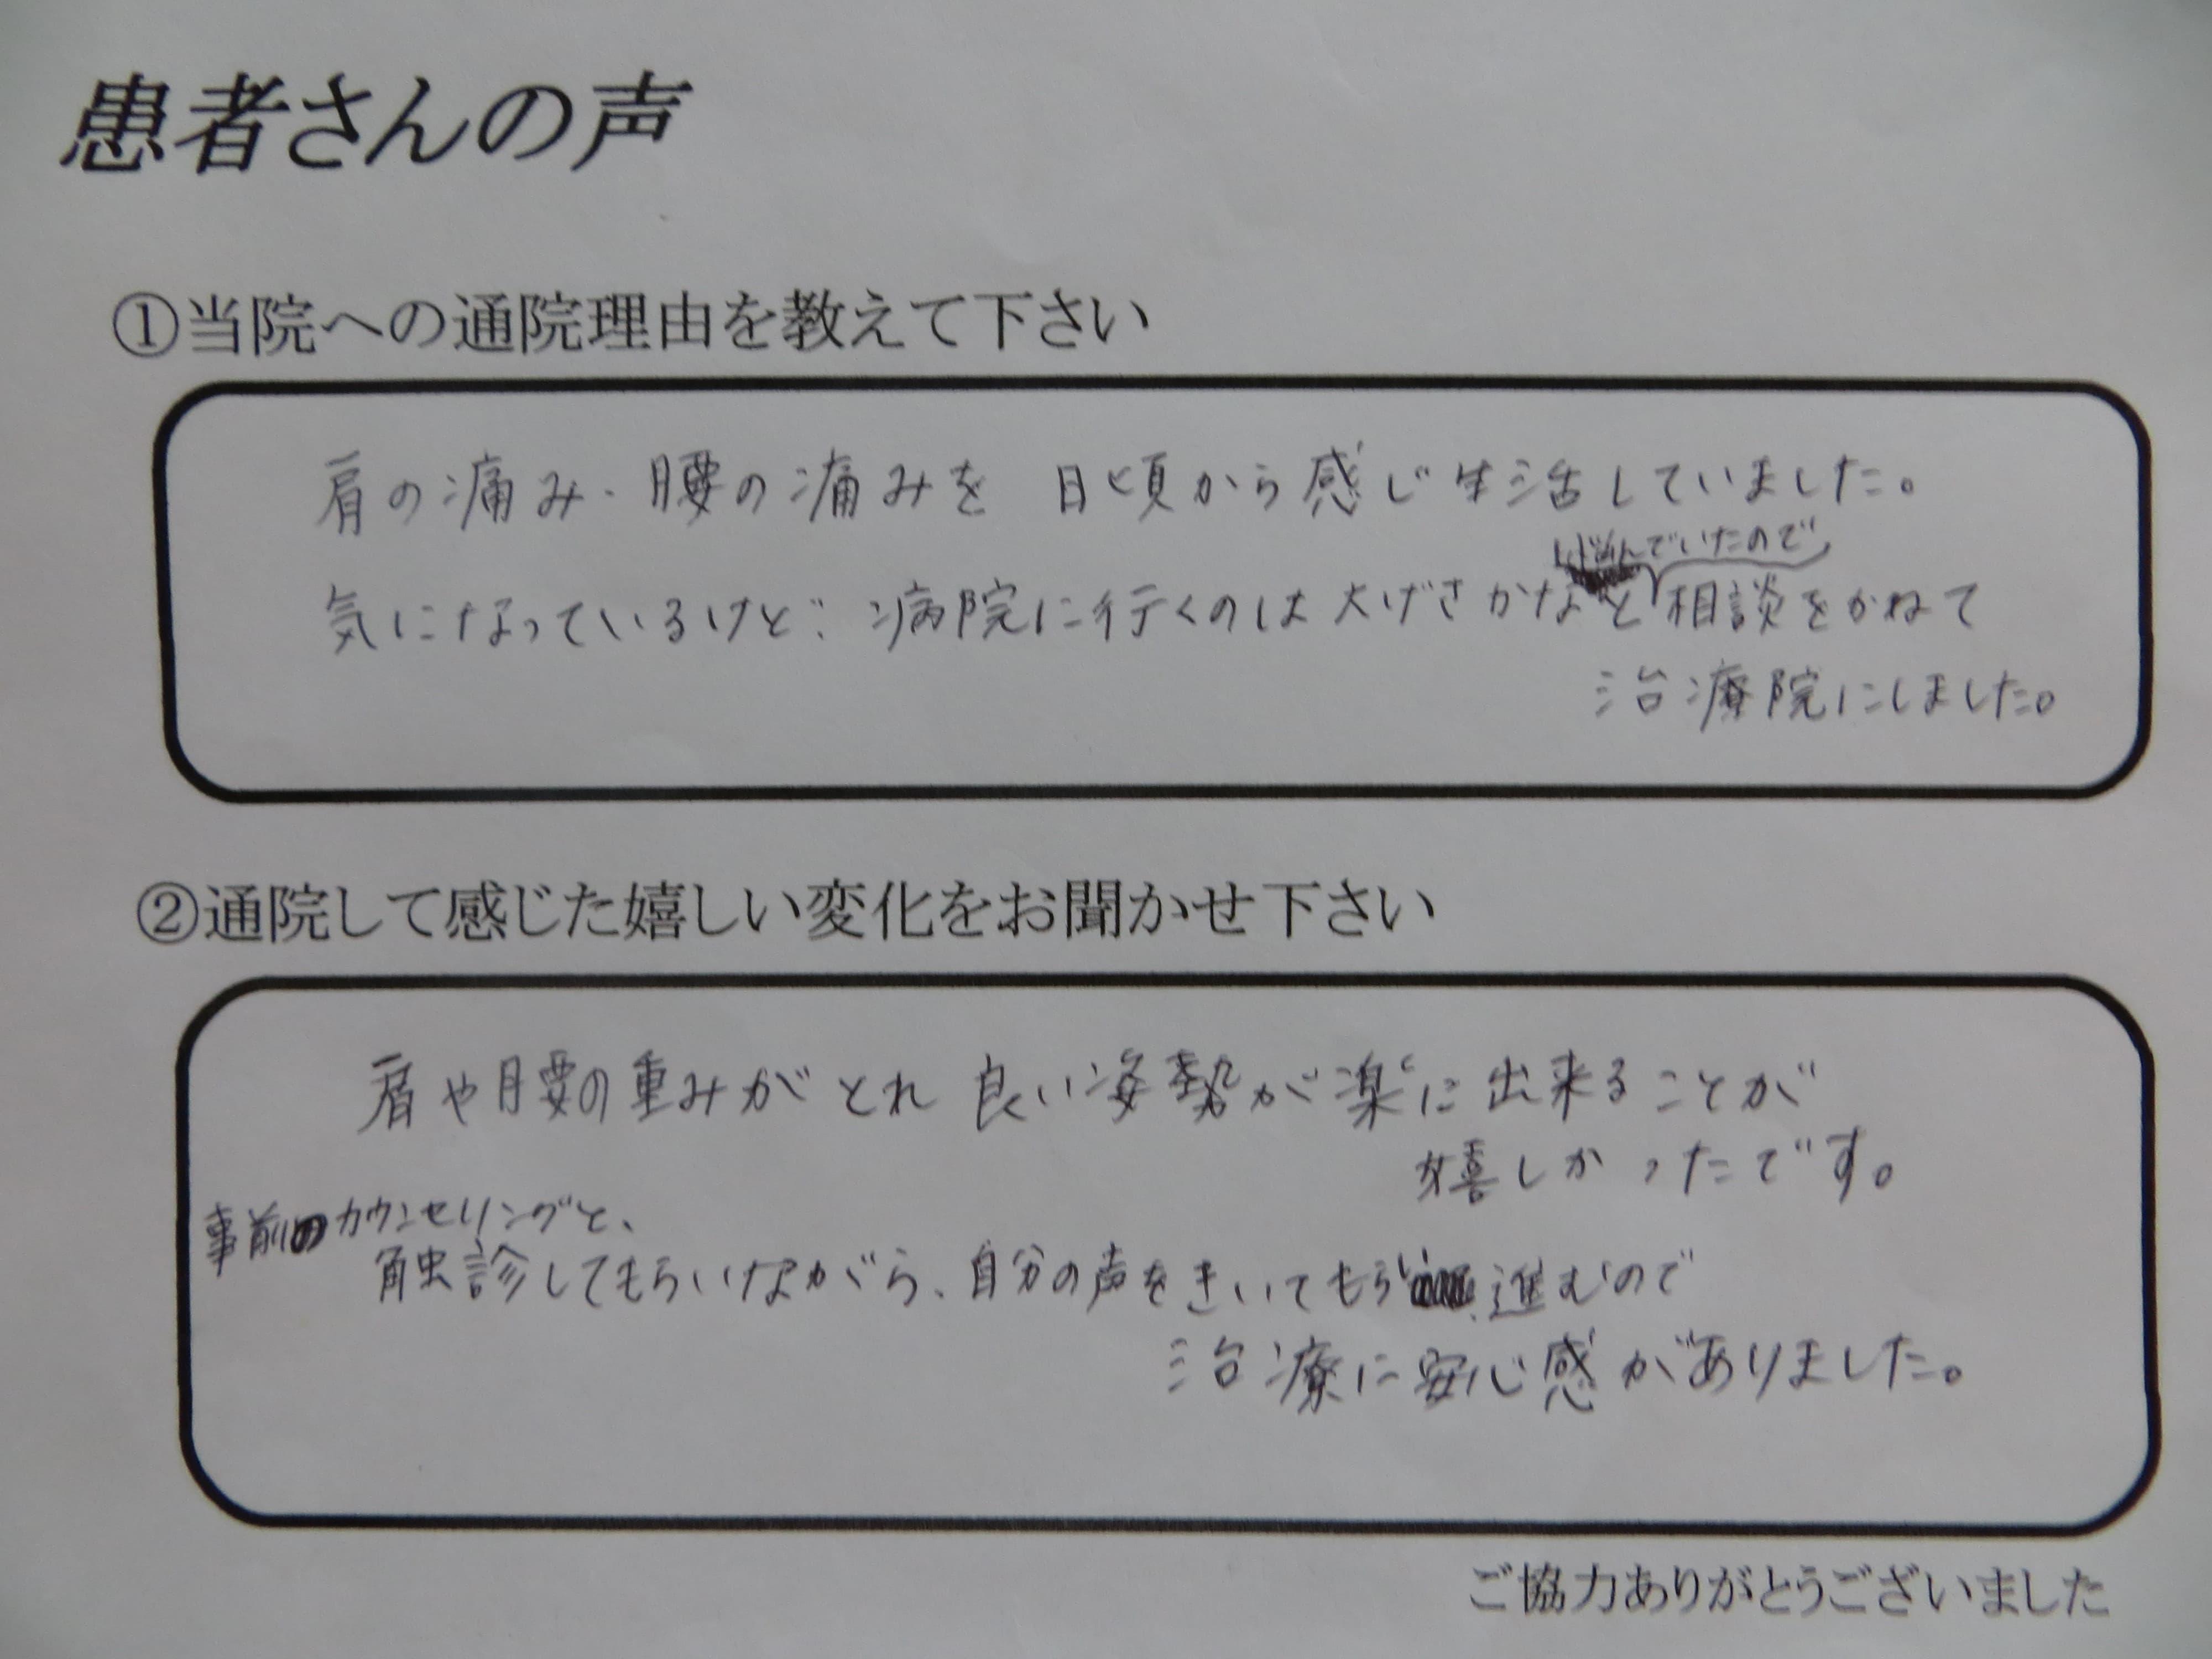 IMG_0728.JPG